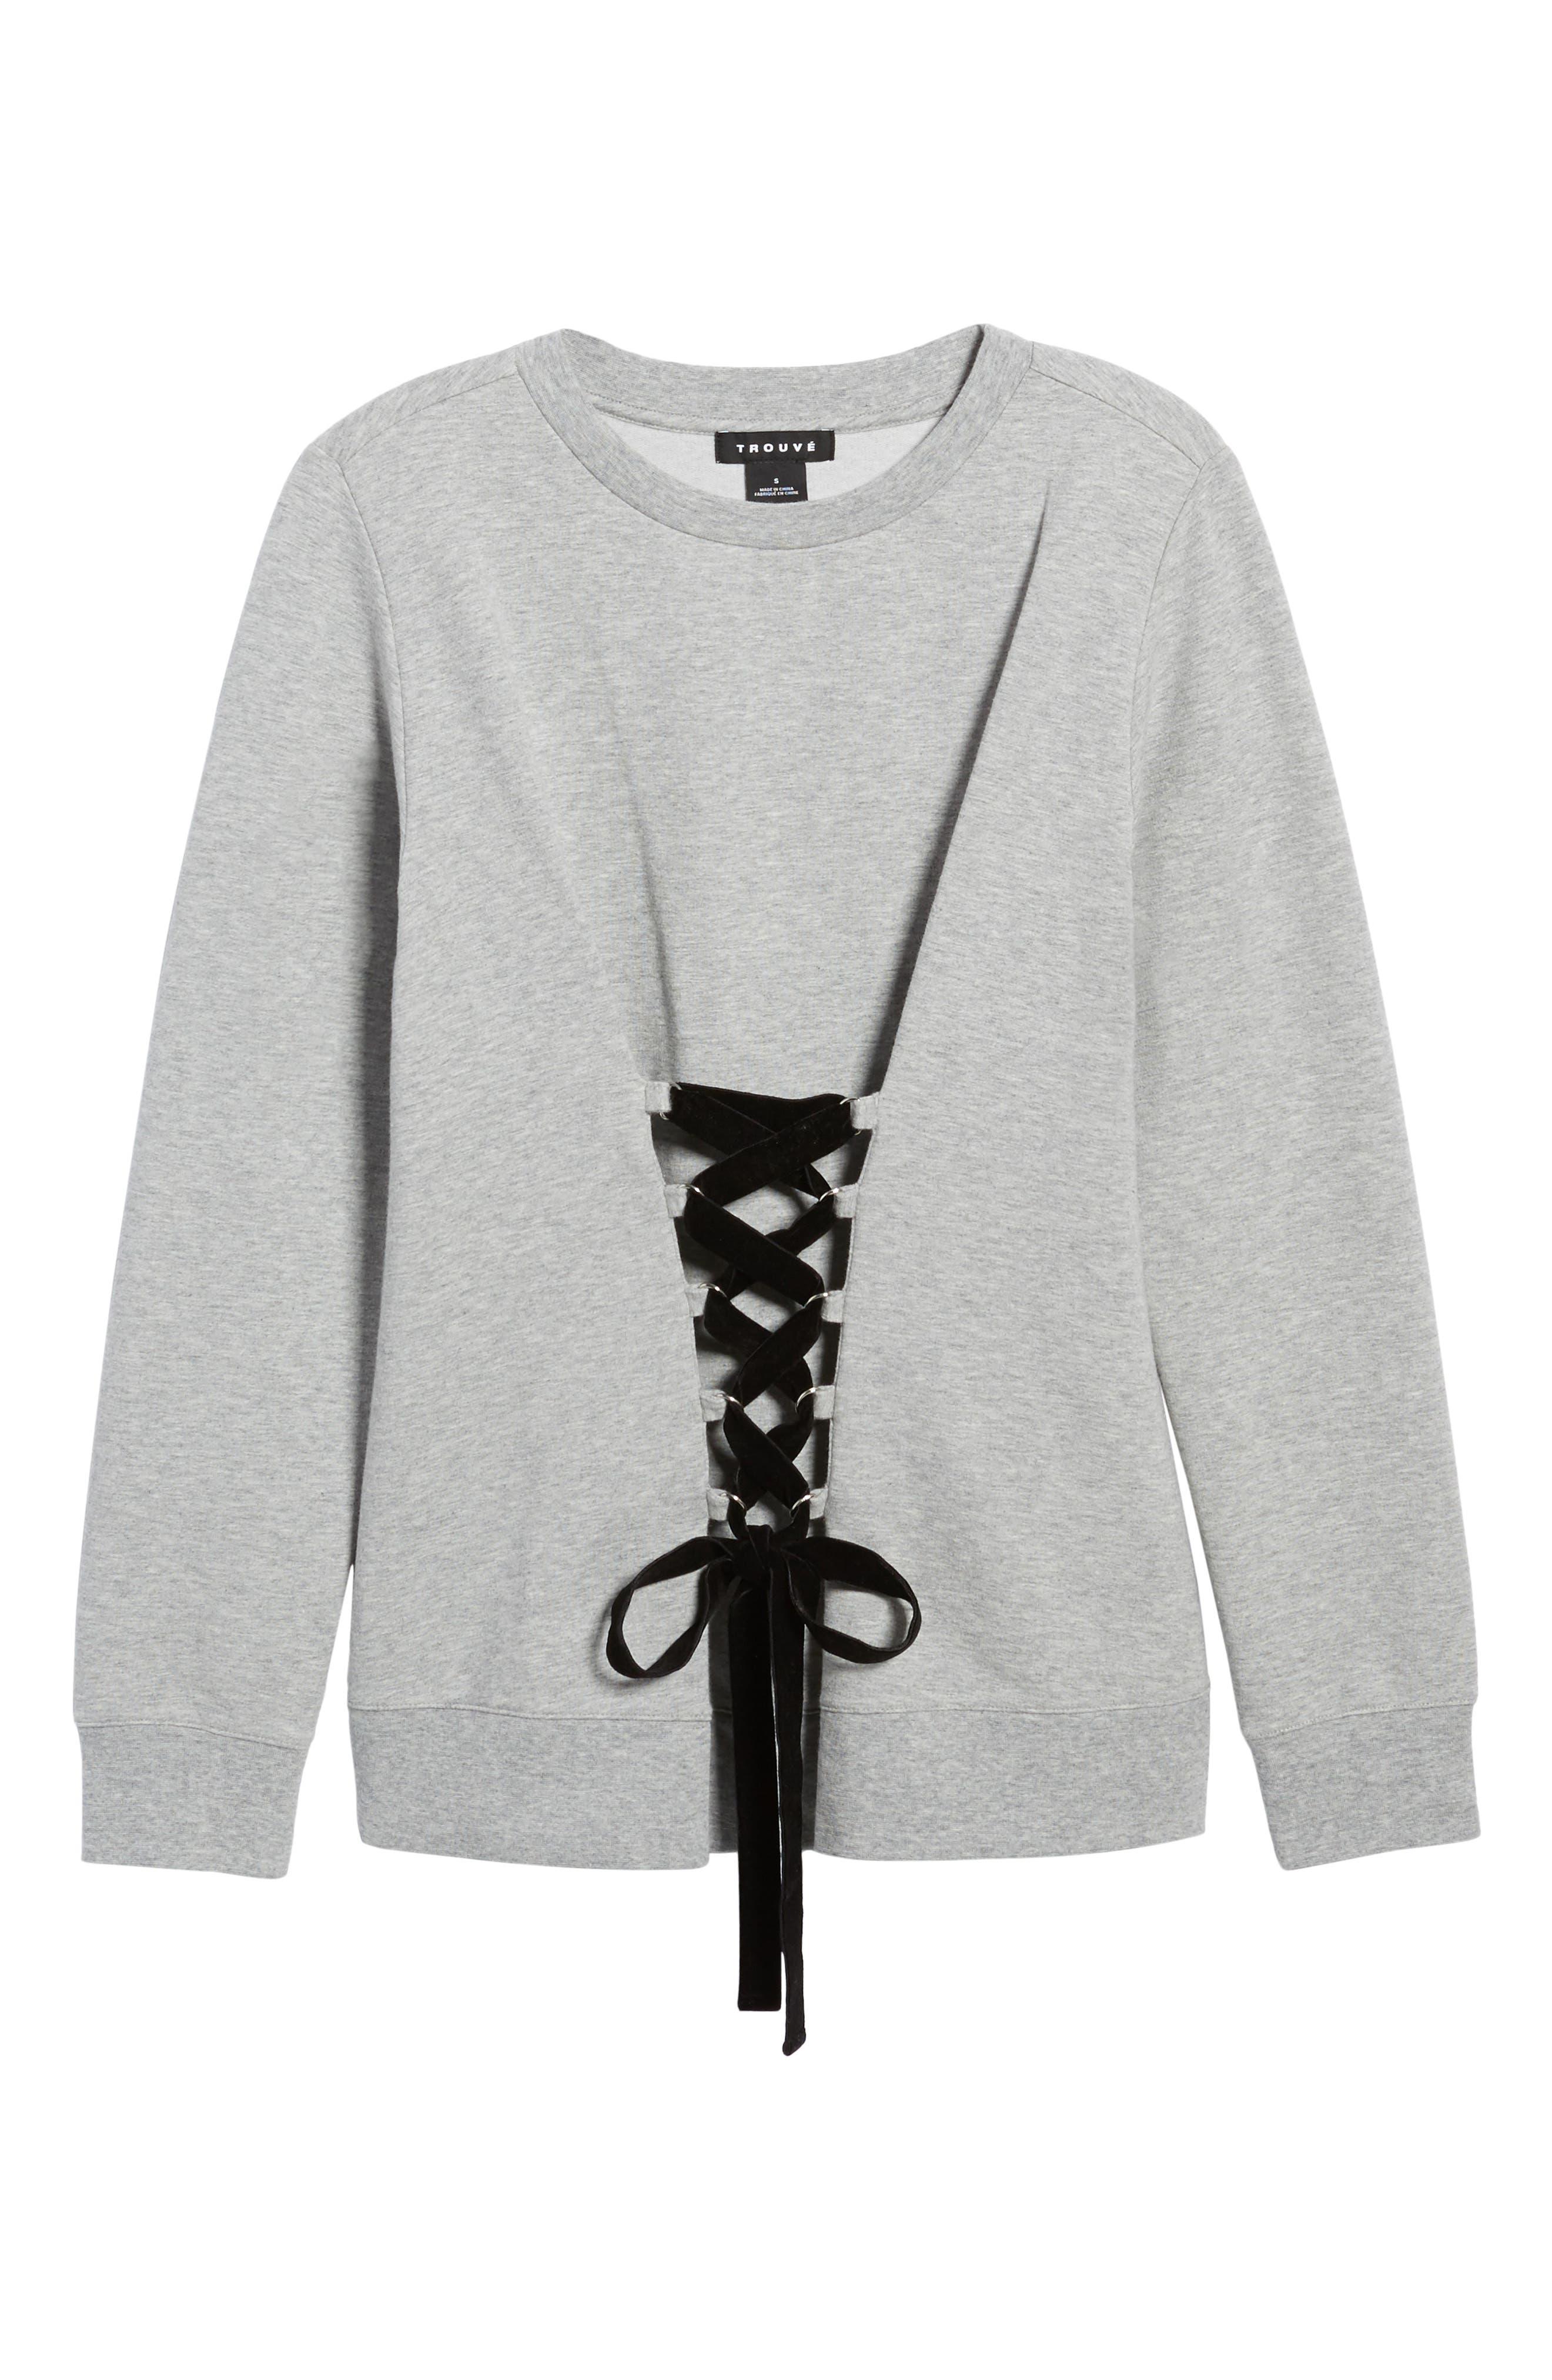 Lace-Up Sweatshirt,                             Alternate thumbnail 6, color,                             050